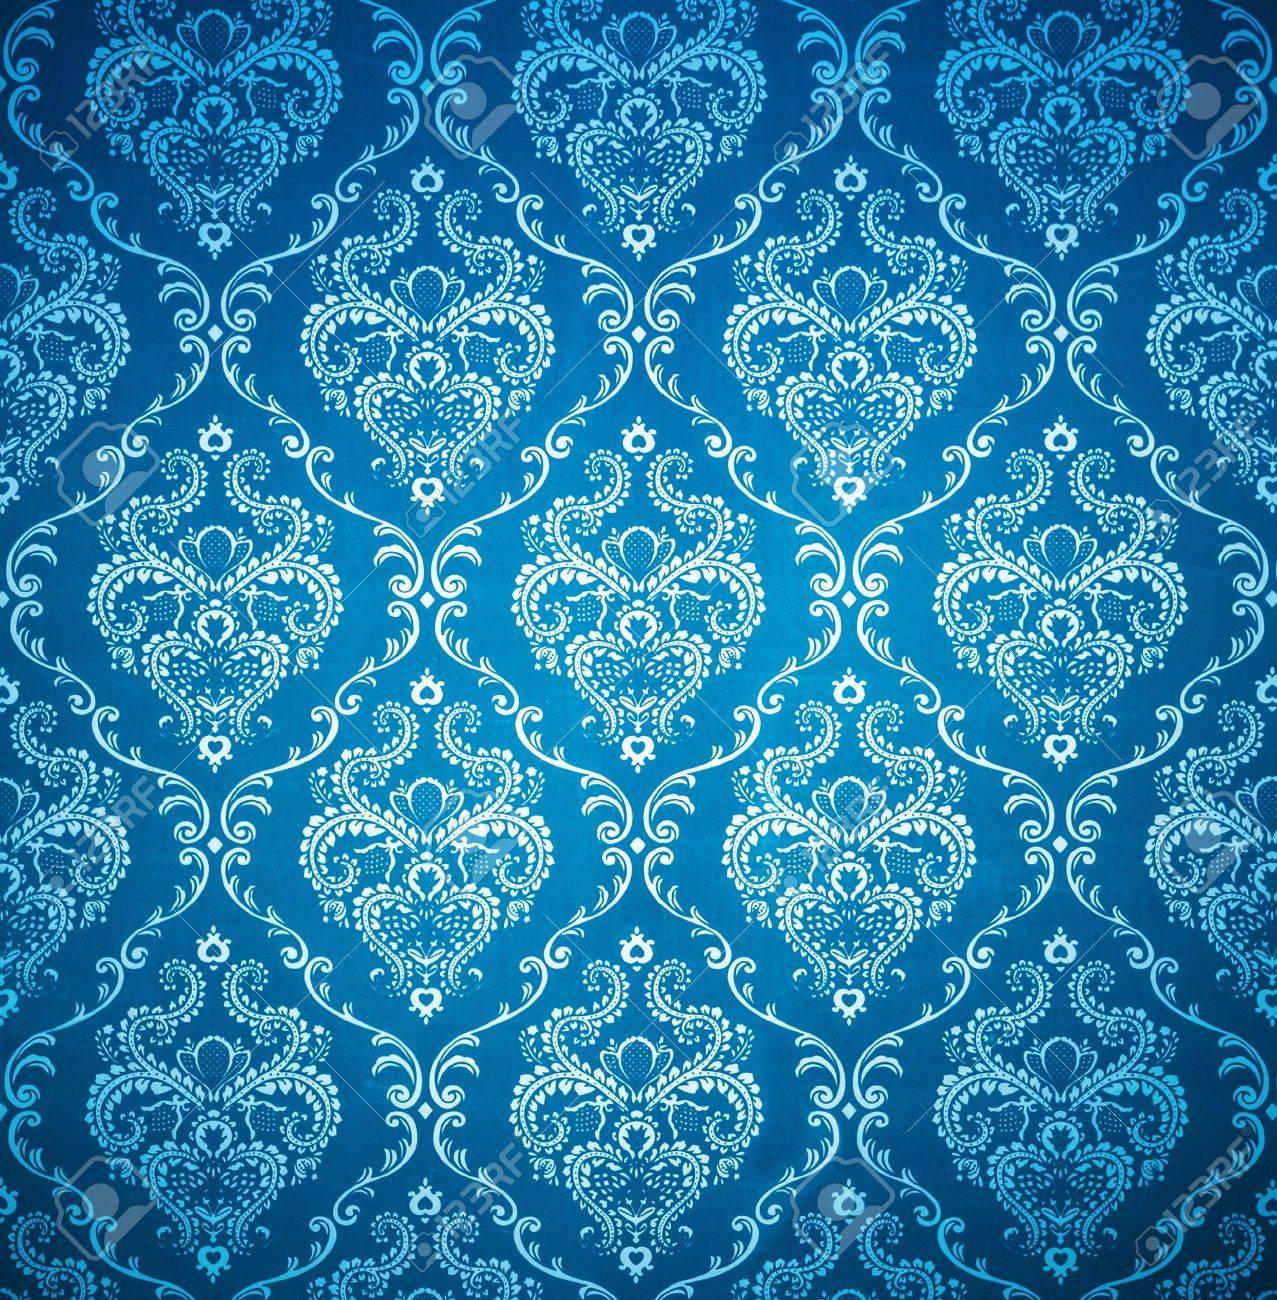 Texture Background Of Seamless Damask Blue Wallpaper